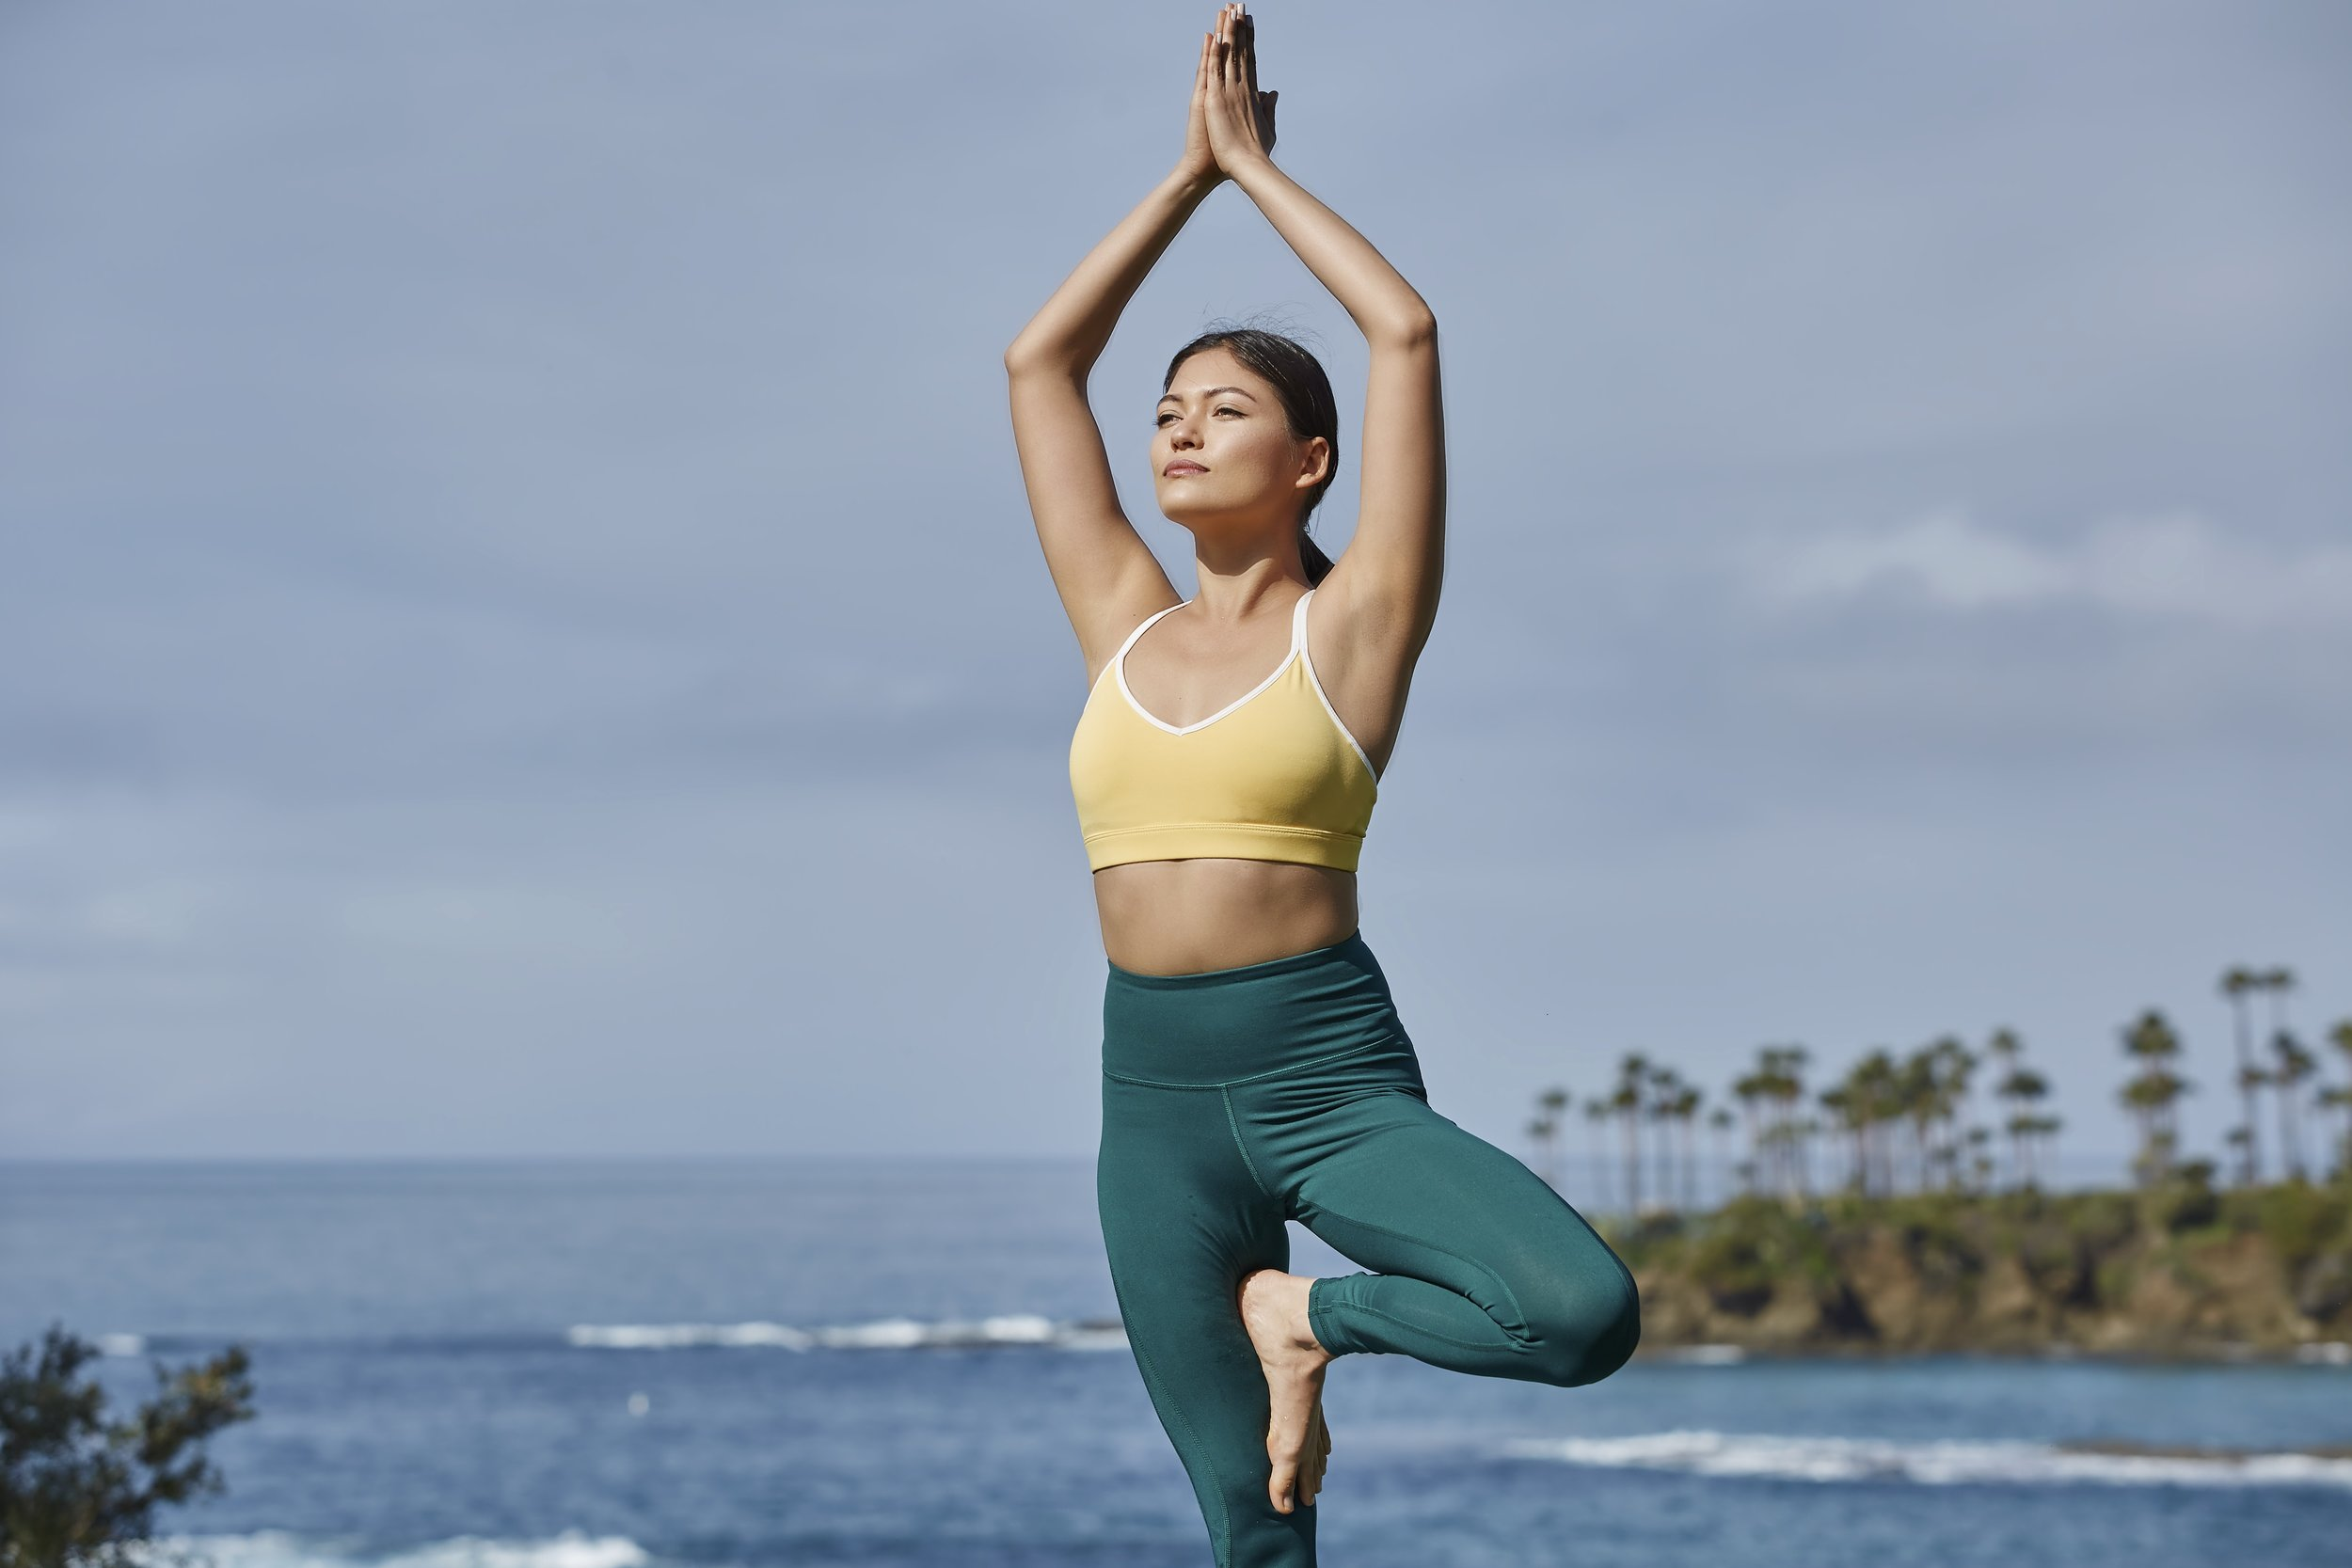 model Kristina - yoga pose.jpg